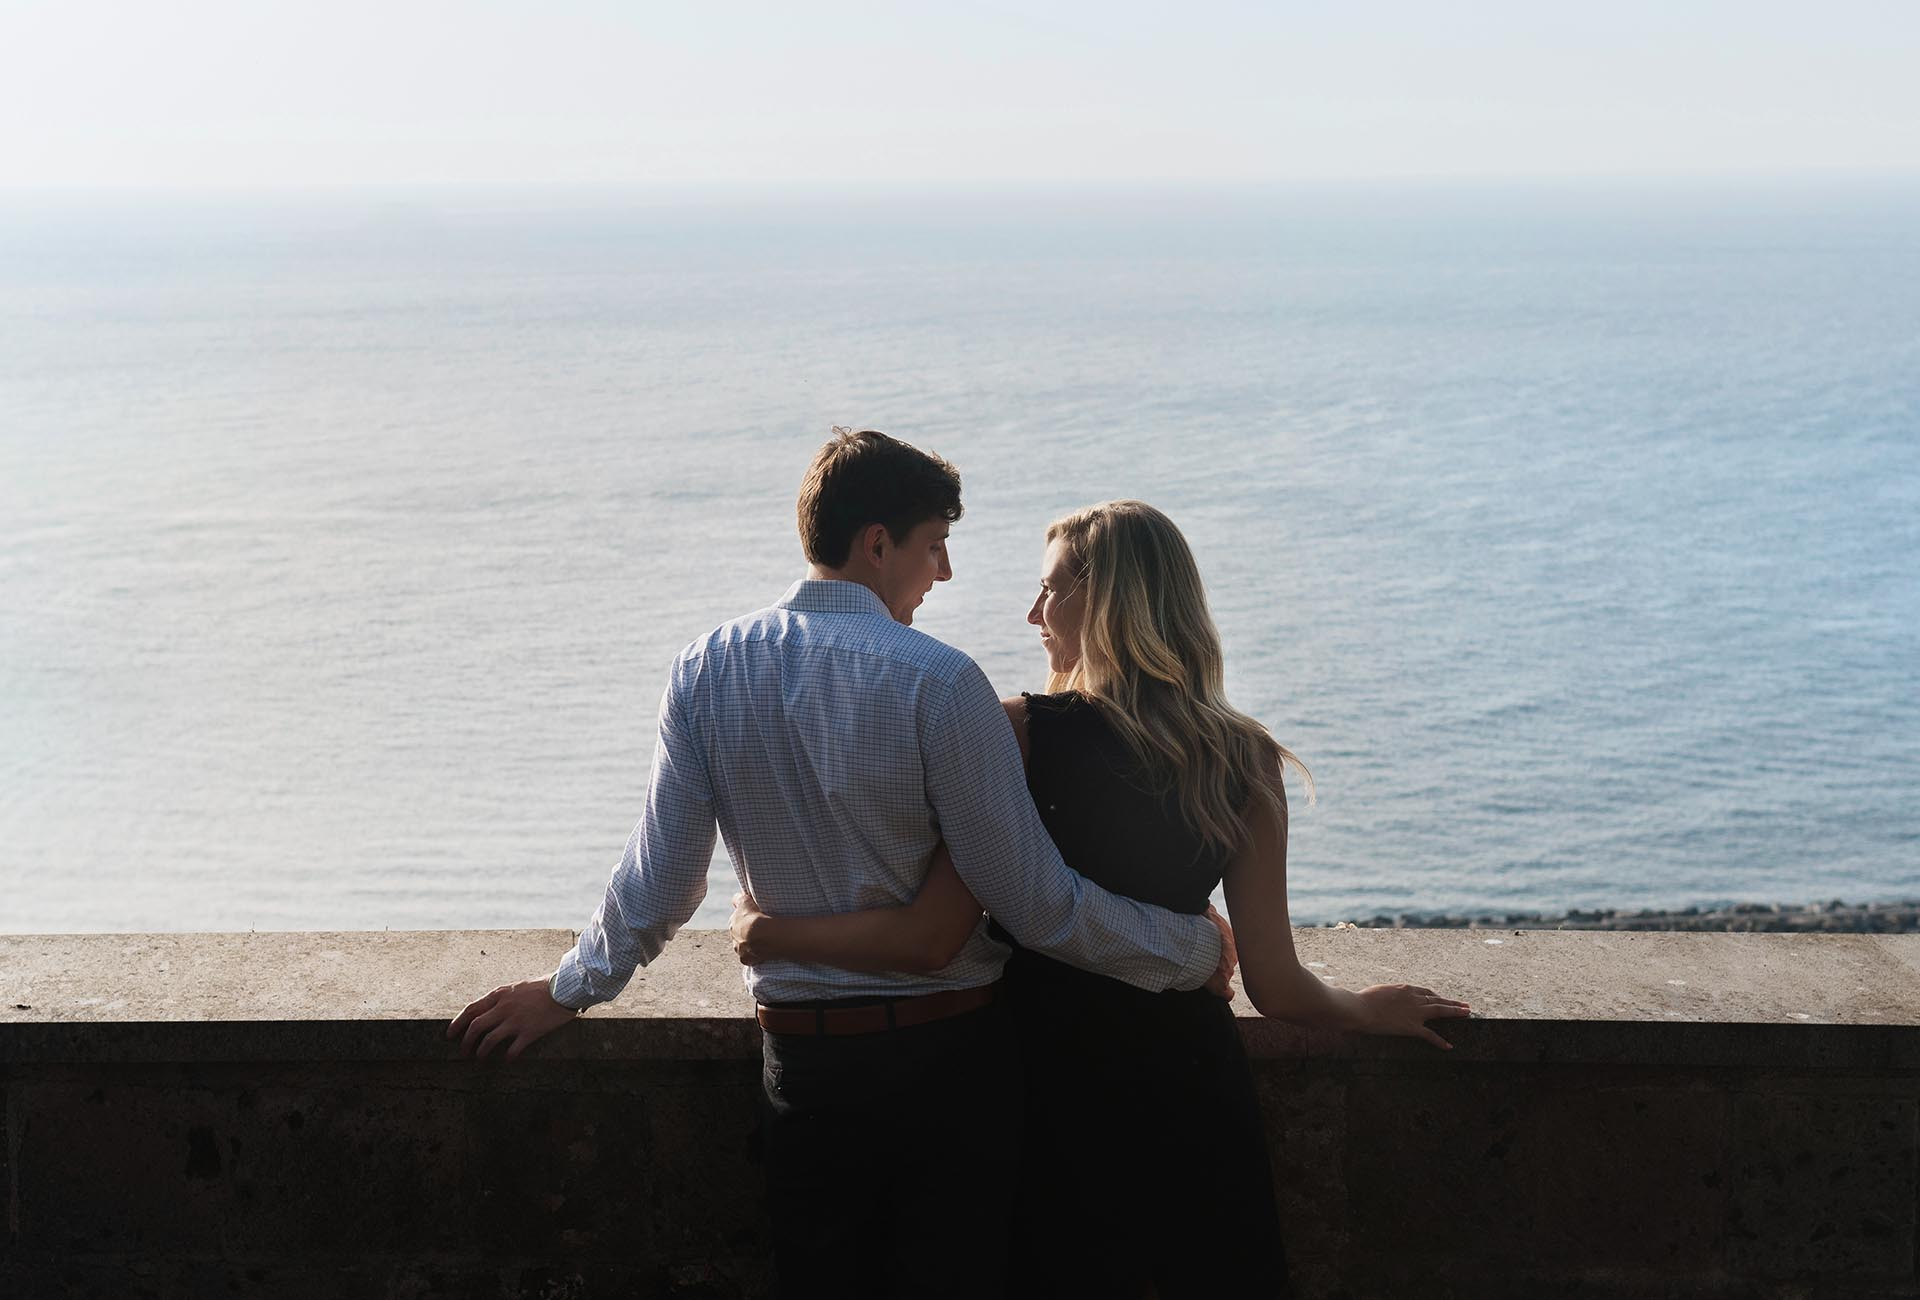 Fotografo Proposta matrimonio Costiera